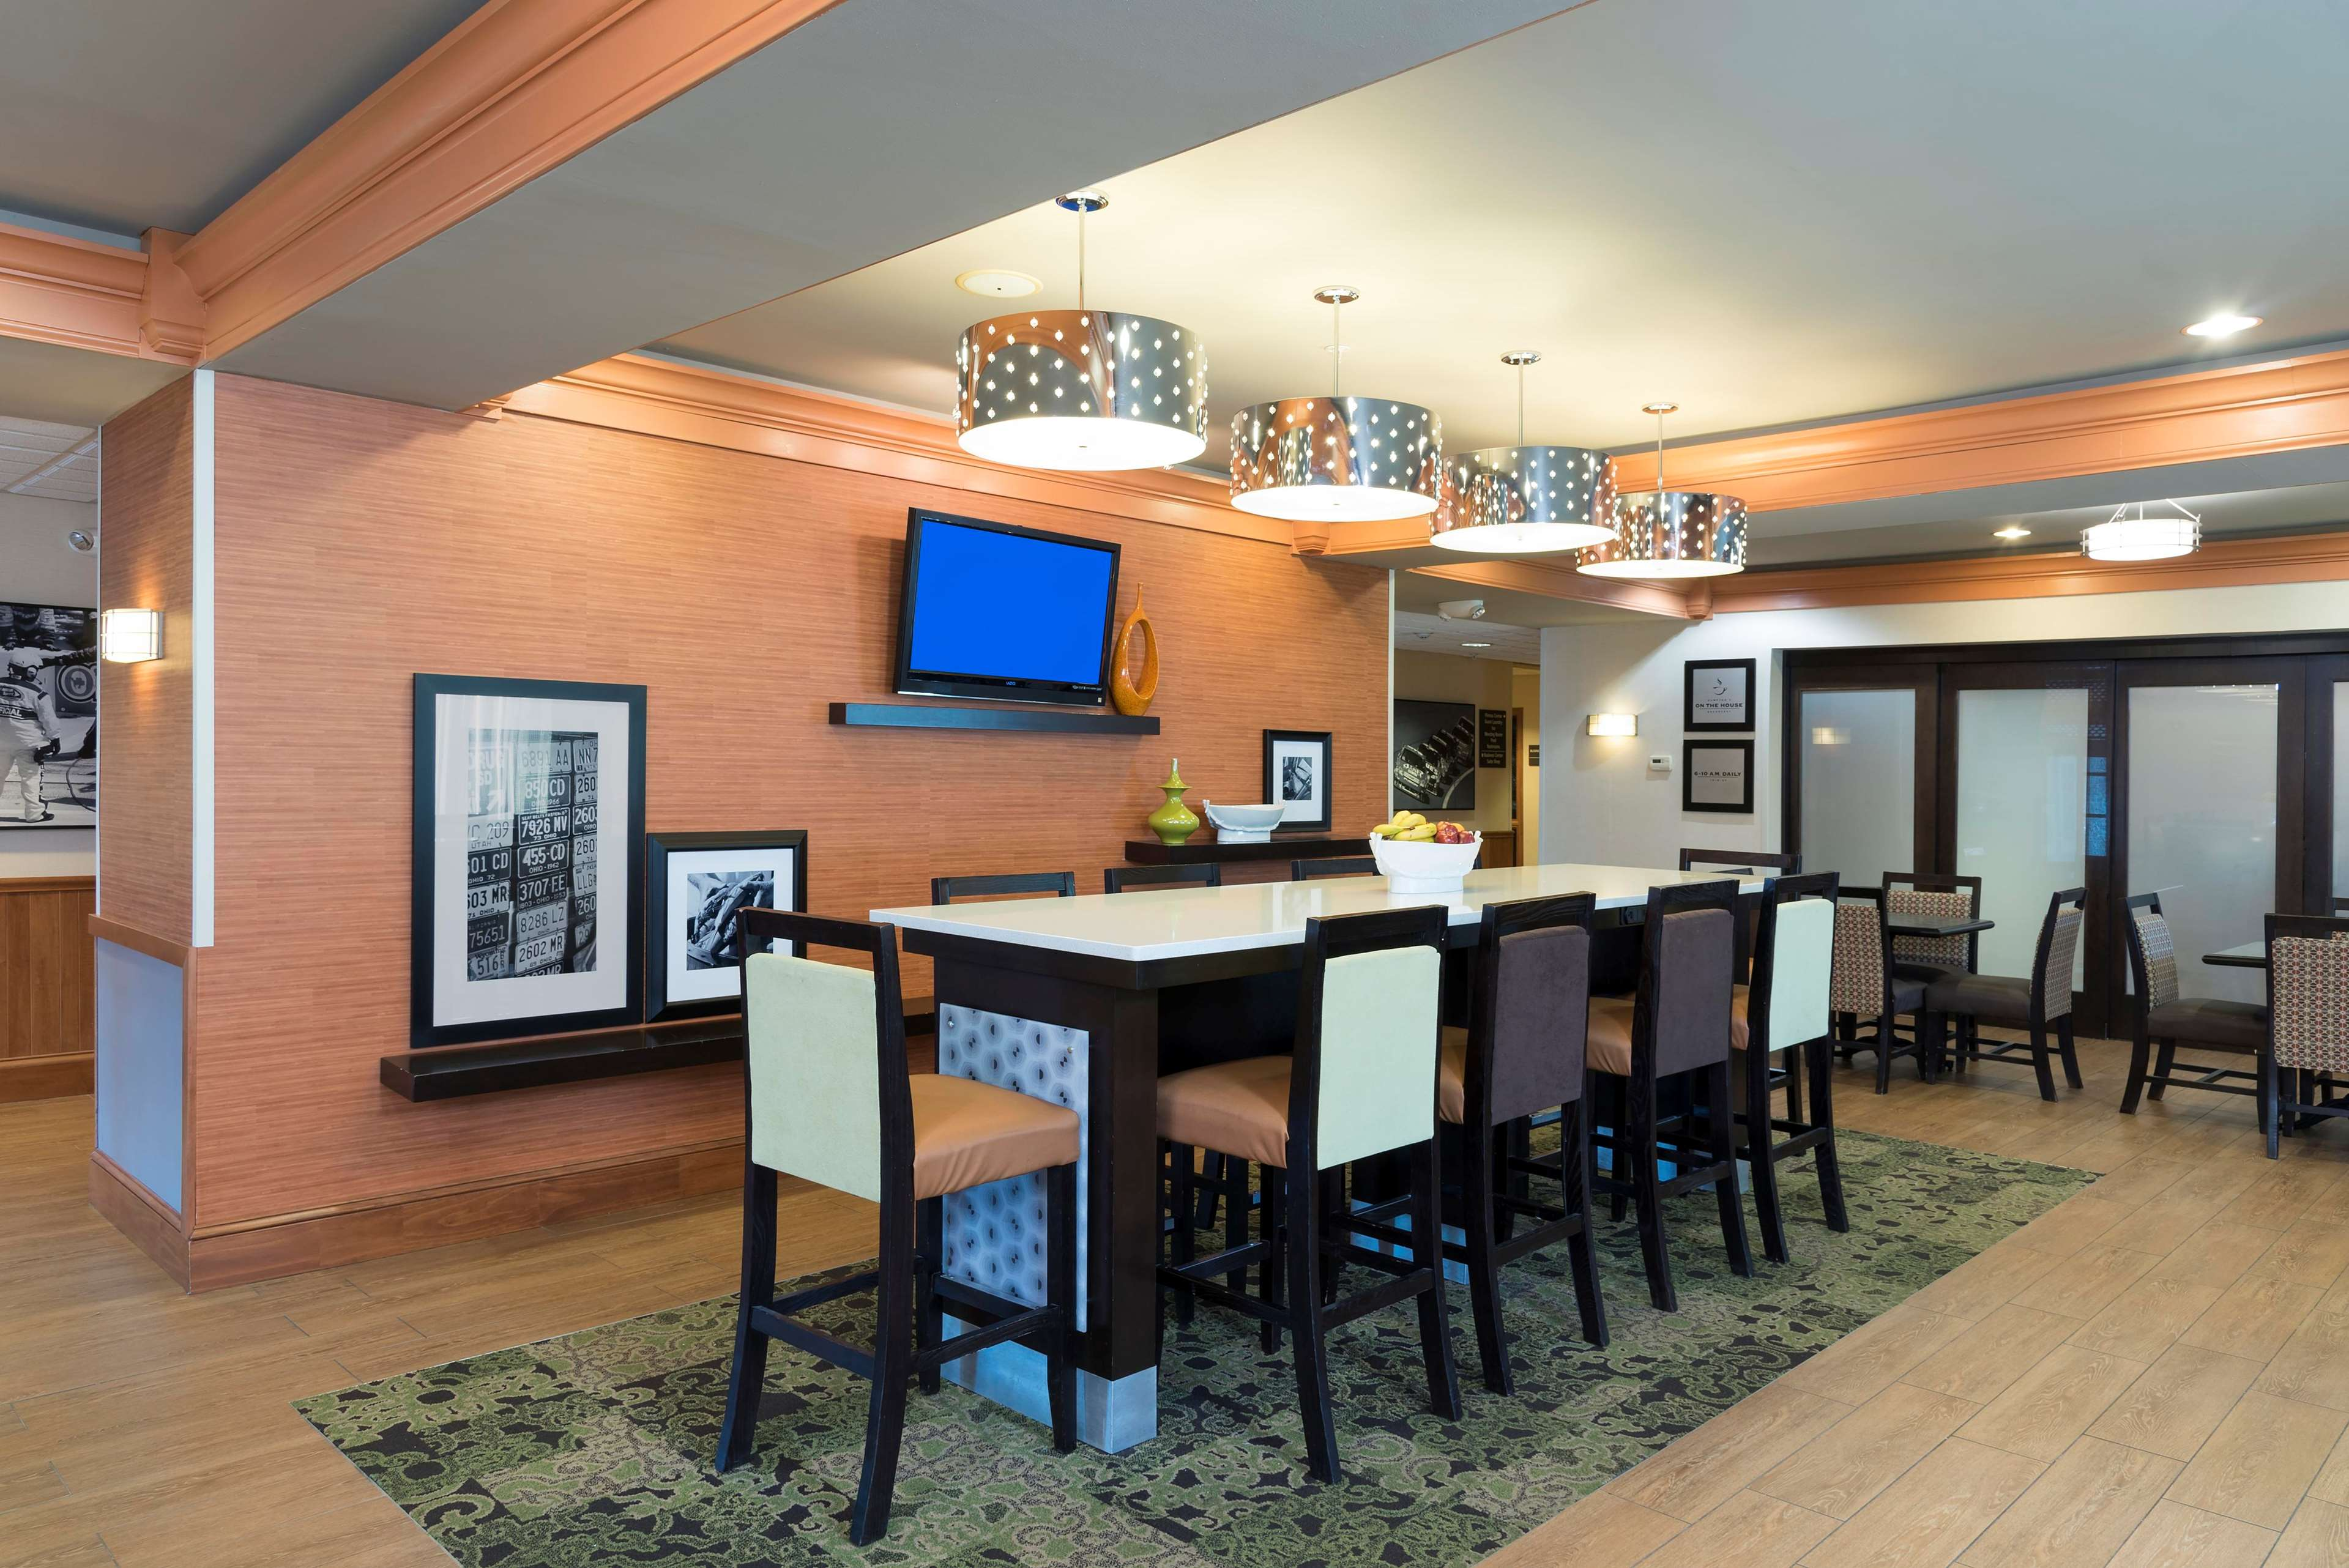 Hampton Inn & Suites Mansfield-South @ I-71 image 13